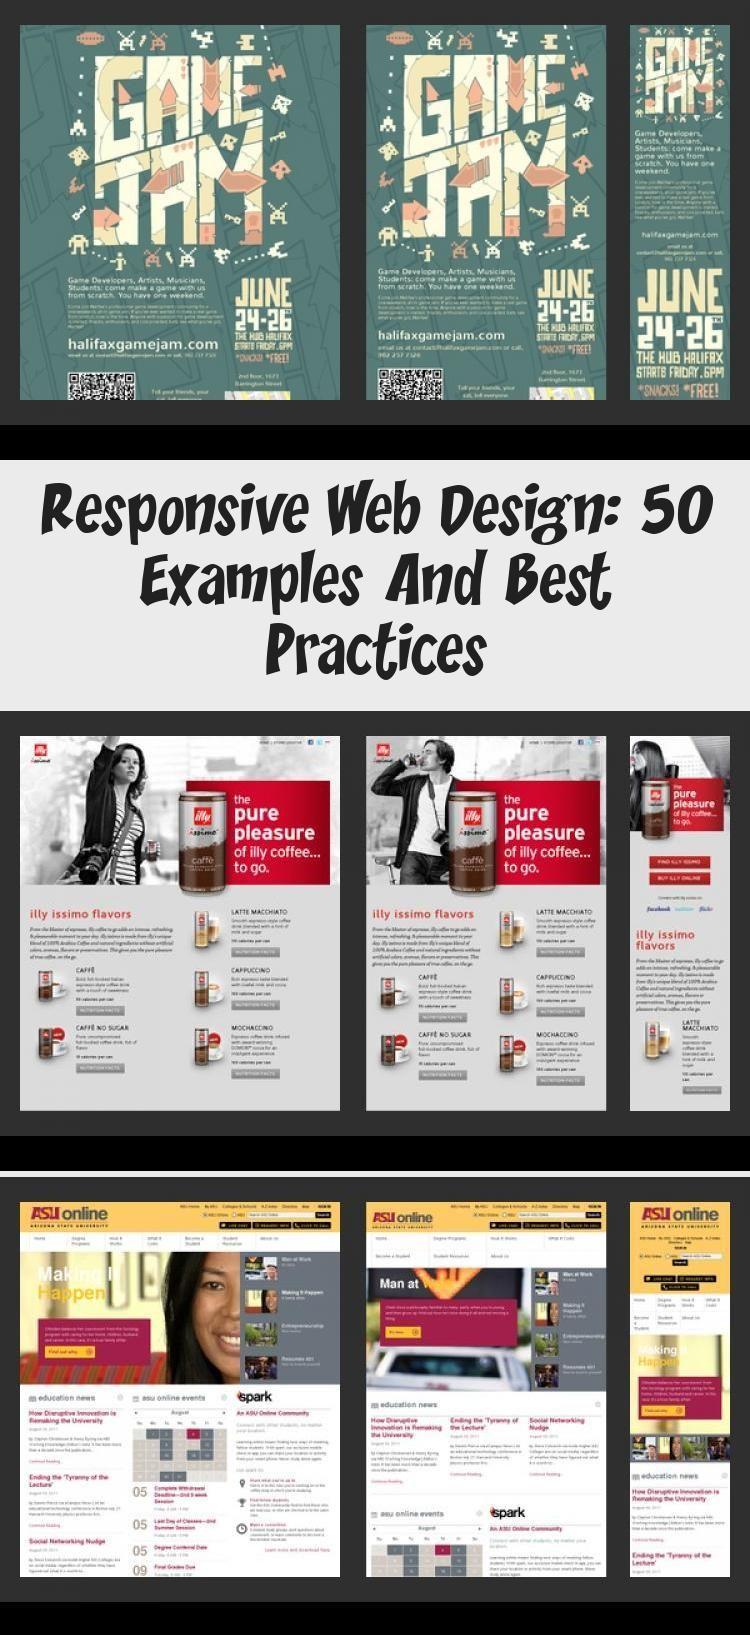 Responsive Web Design 50 Examples And Best Practices Design Design Examples Practices Responsive Web En 2020 Blog